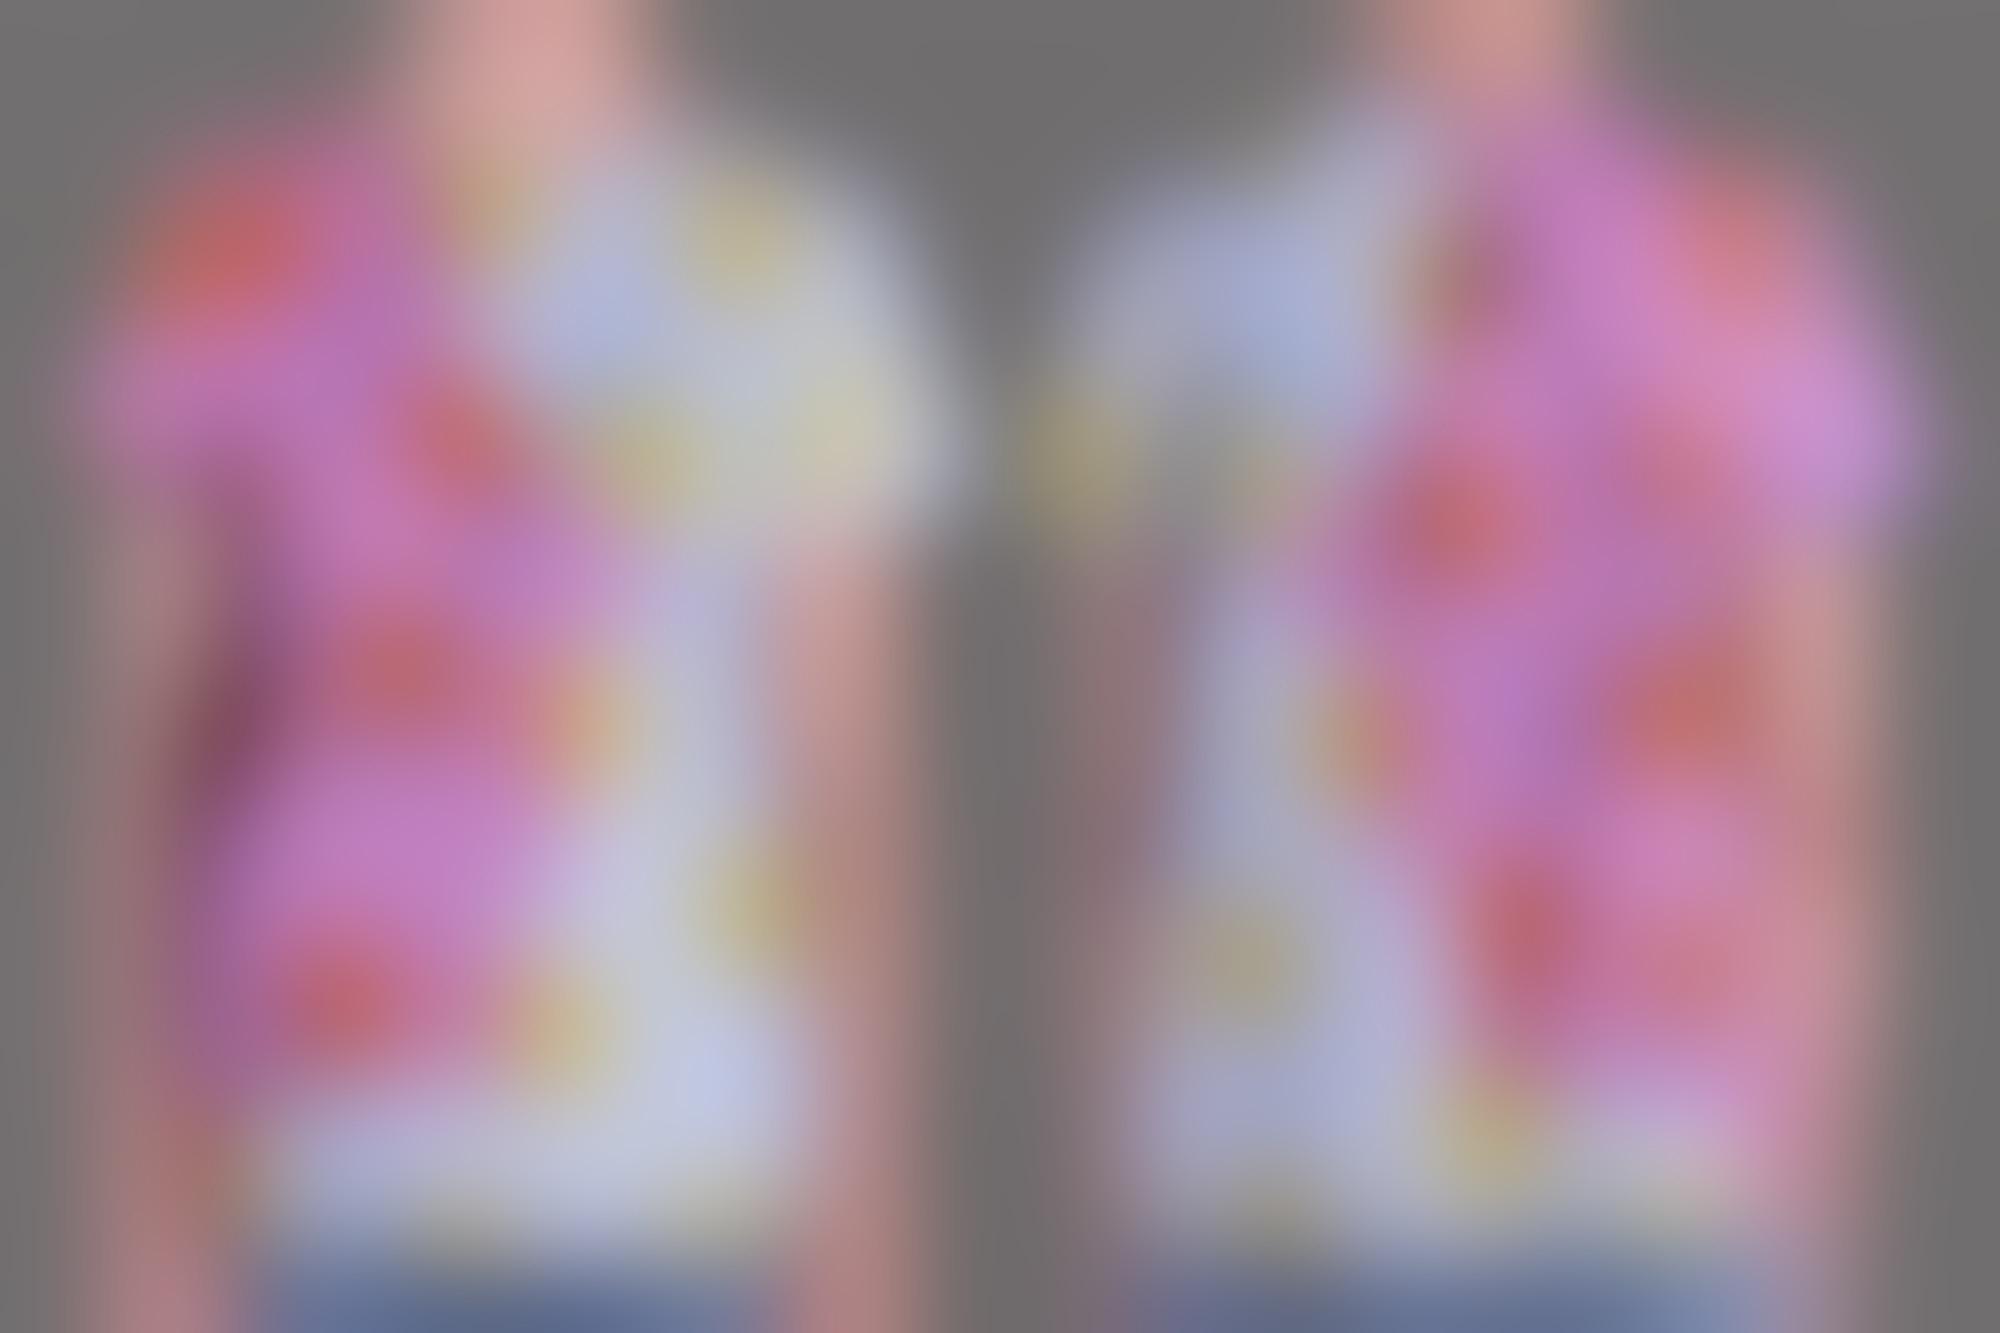 RISOTTO x Emily Millichip Colaboration 2 2016 autocompressfitresizeixlibphp 1 1 0max h2000max w3 D2000q80sd2f4f5d9400489f17487ce04d926a9df